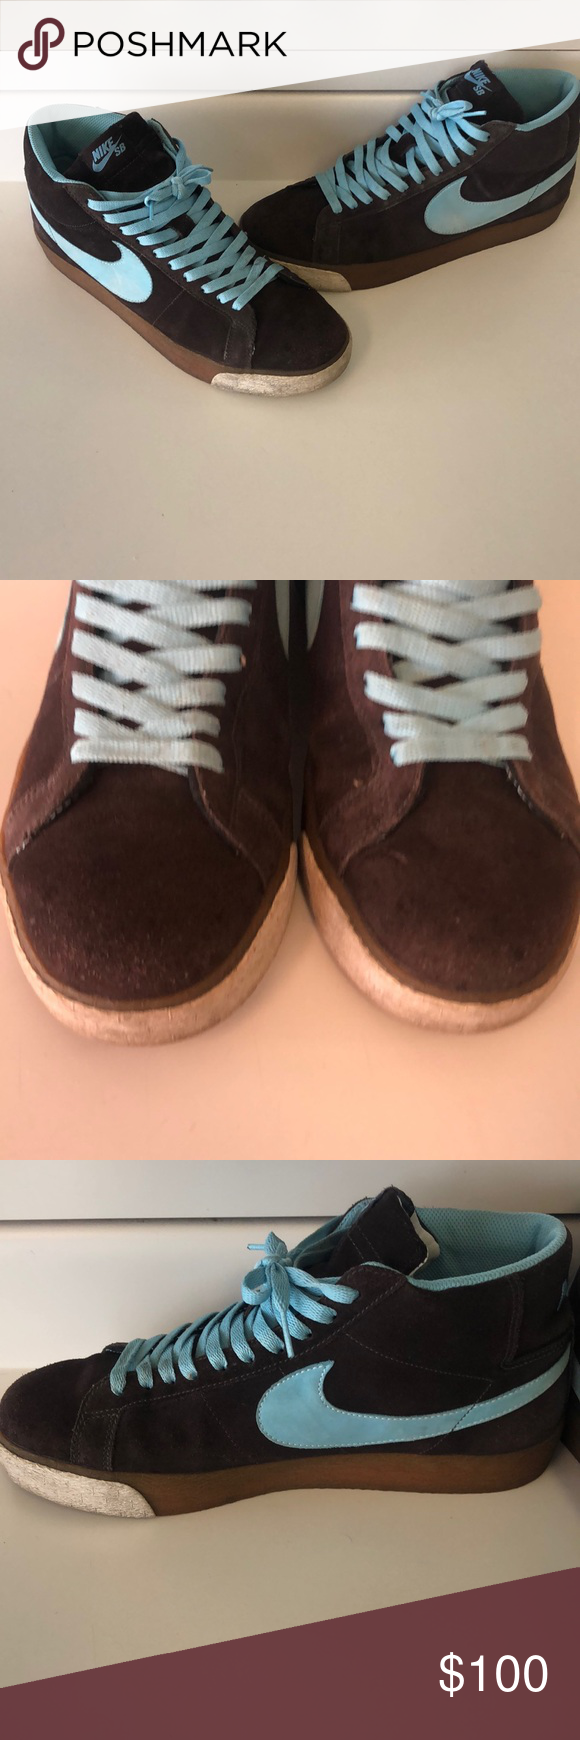 brand new 53d28 e6e63 NIKE BLAZER SB CAPPUCCINO BROWN BLUE HI SUPREME Men s size 11 CHILL BROWN  GUM DUNK VINTAGE 2008 baby blue Nike Shoes Sneakers